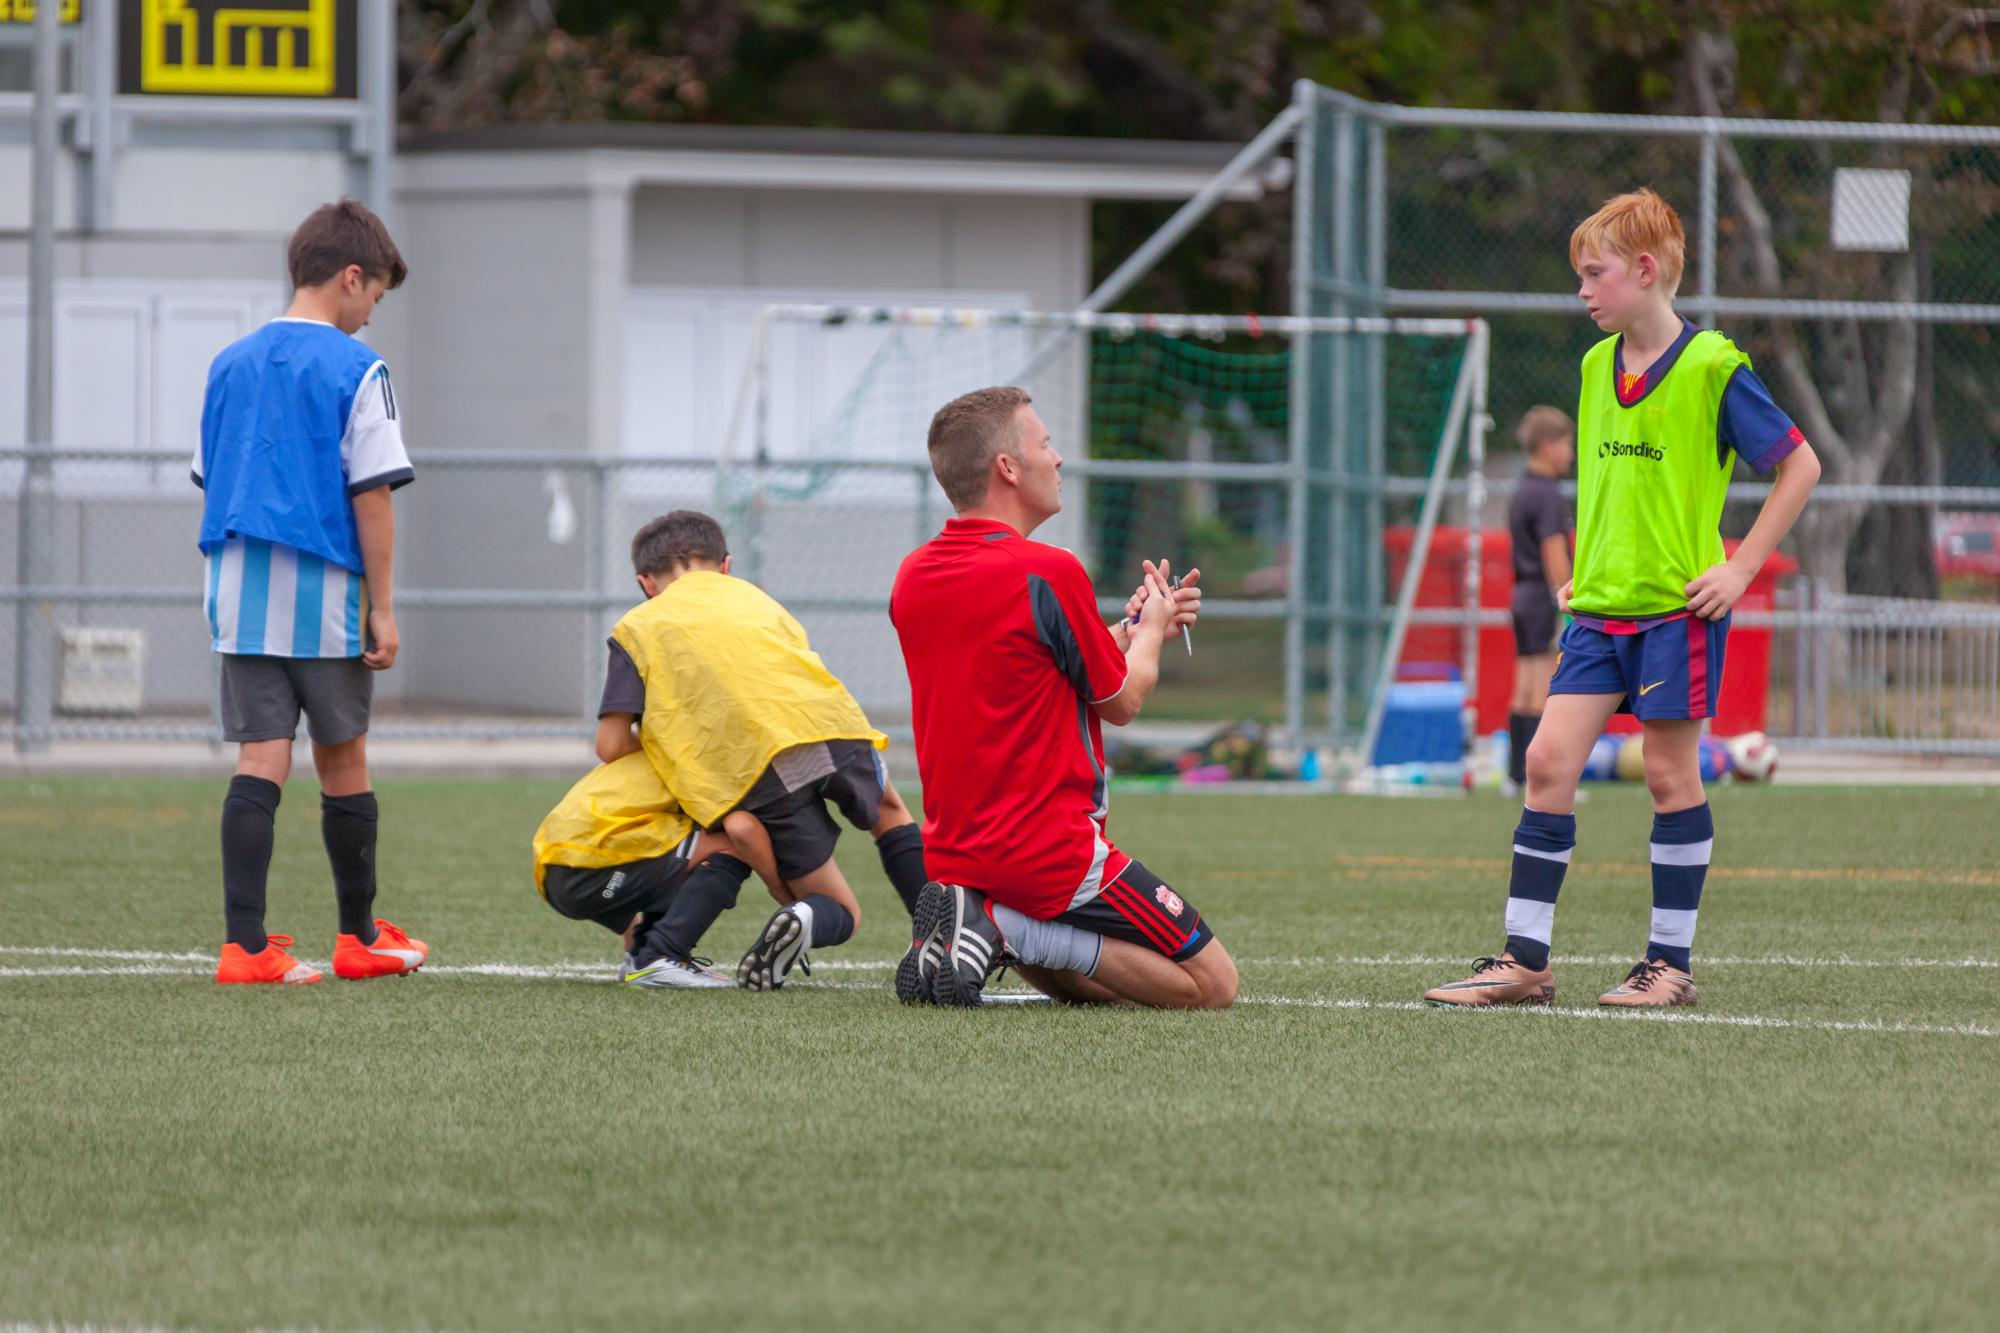 UHCC Soccer Coach 4434